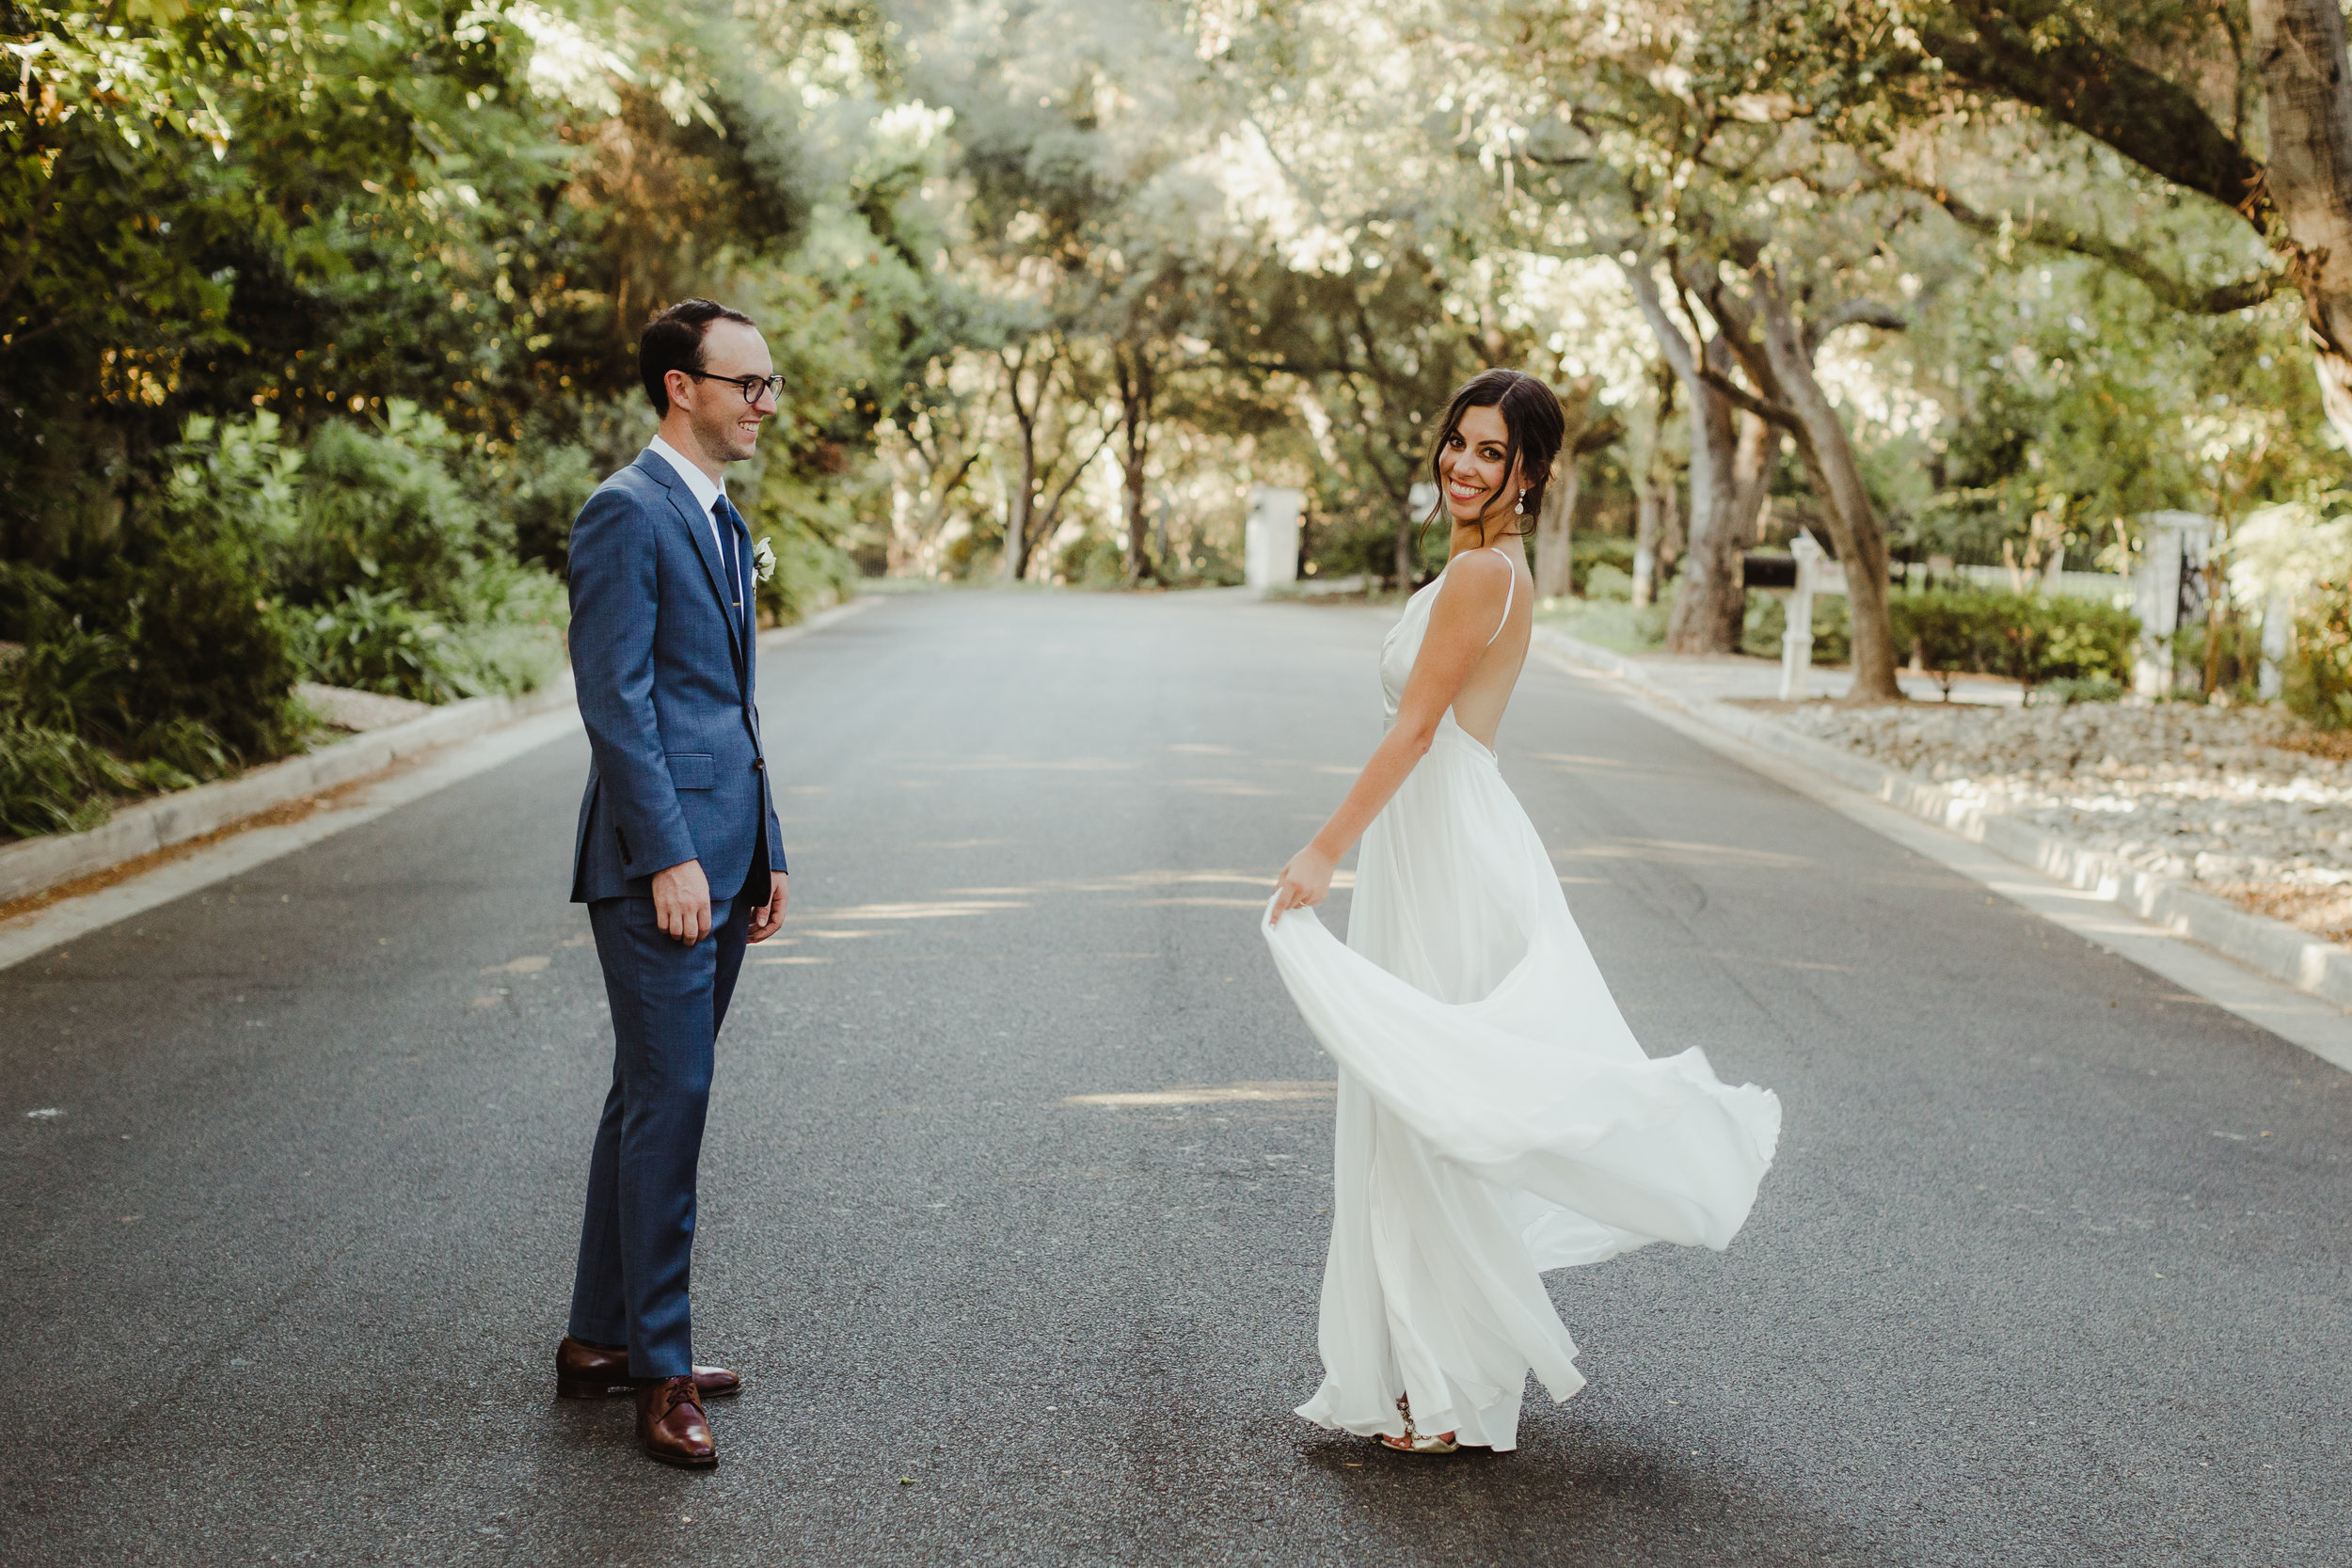 Pasadena+Backyard+Wedding+by+Hannah+Costello.jpg